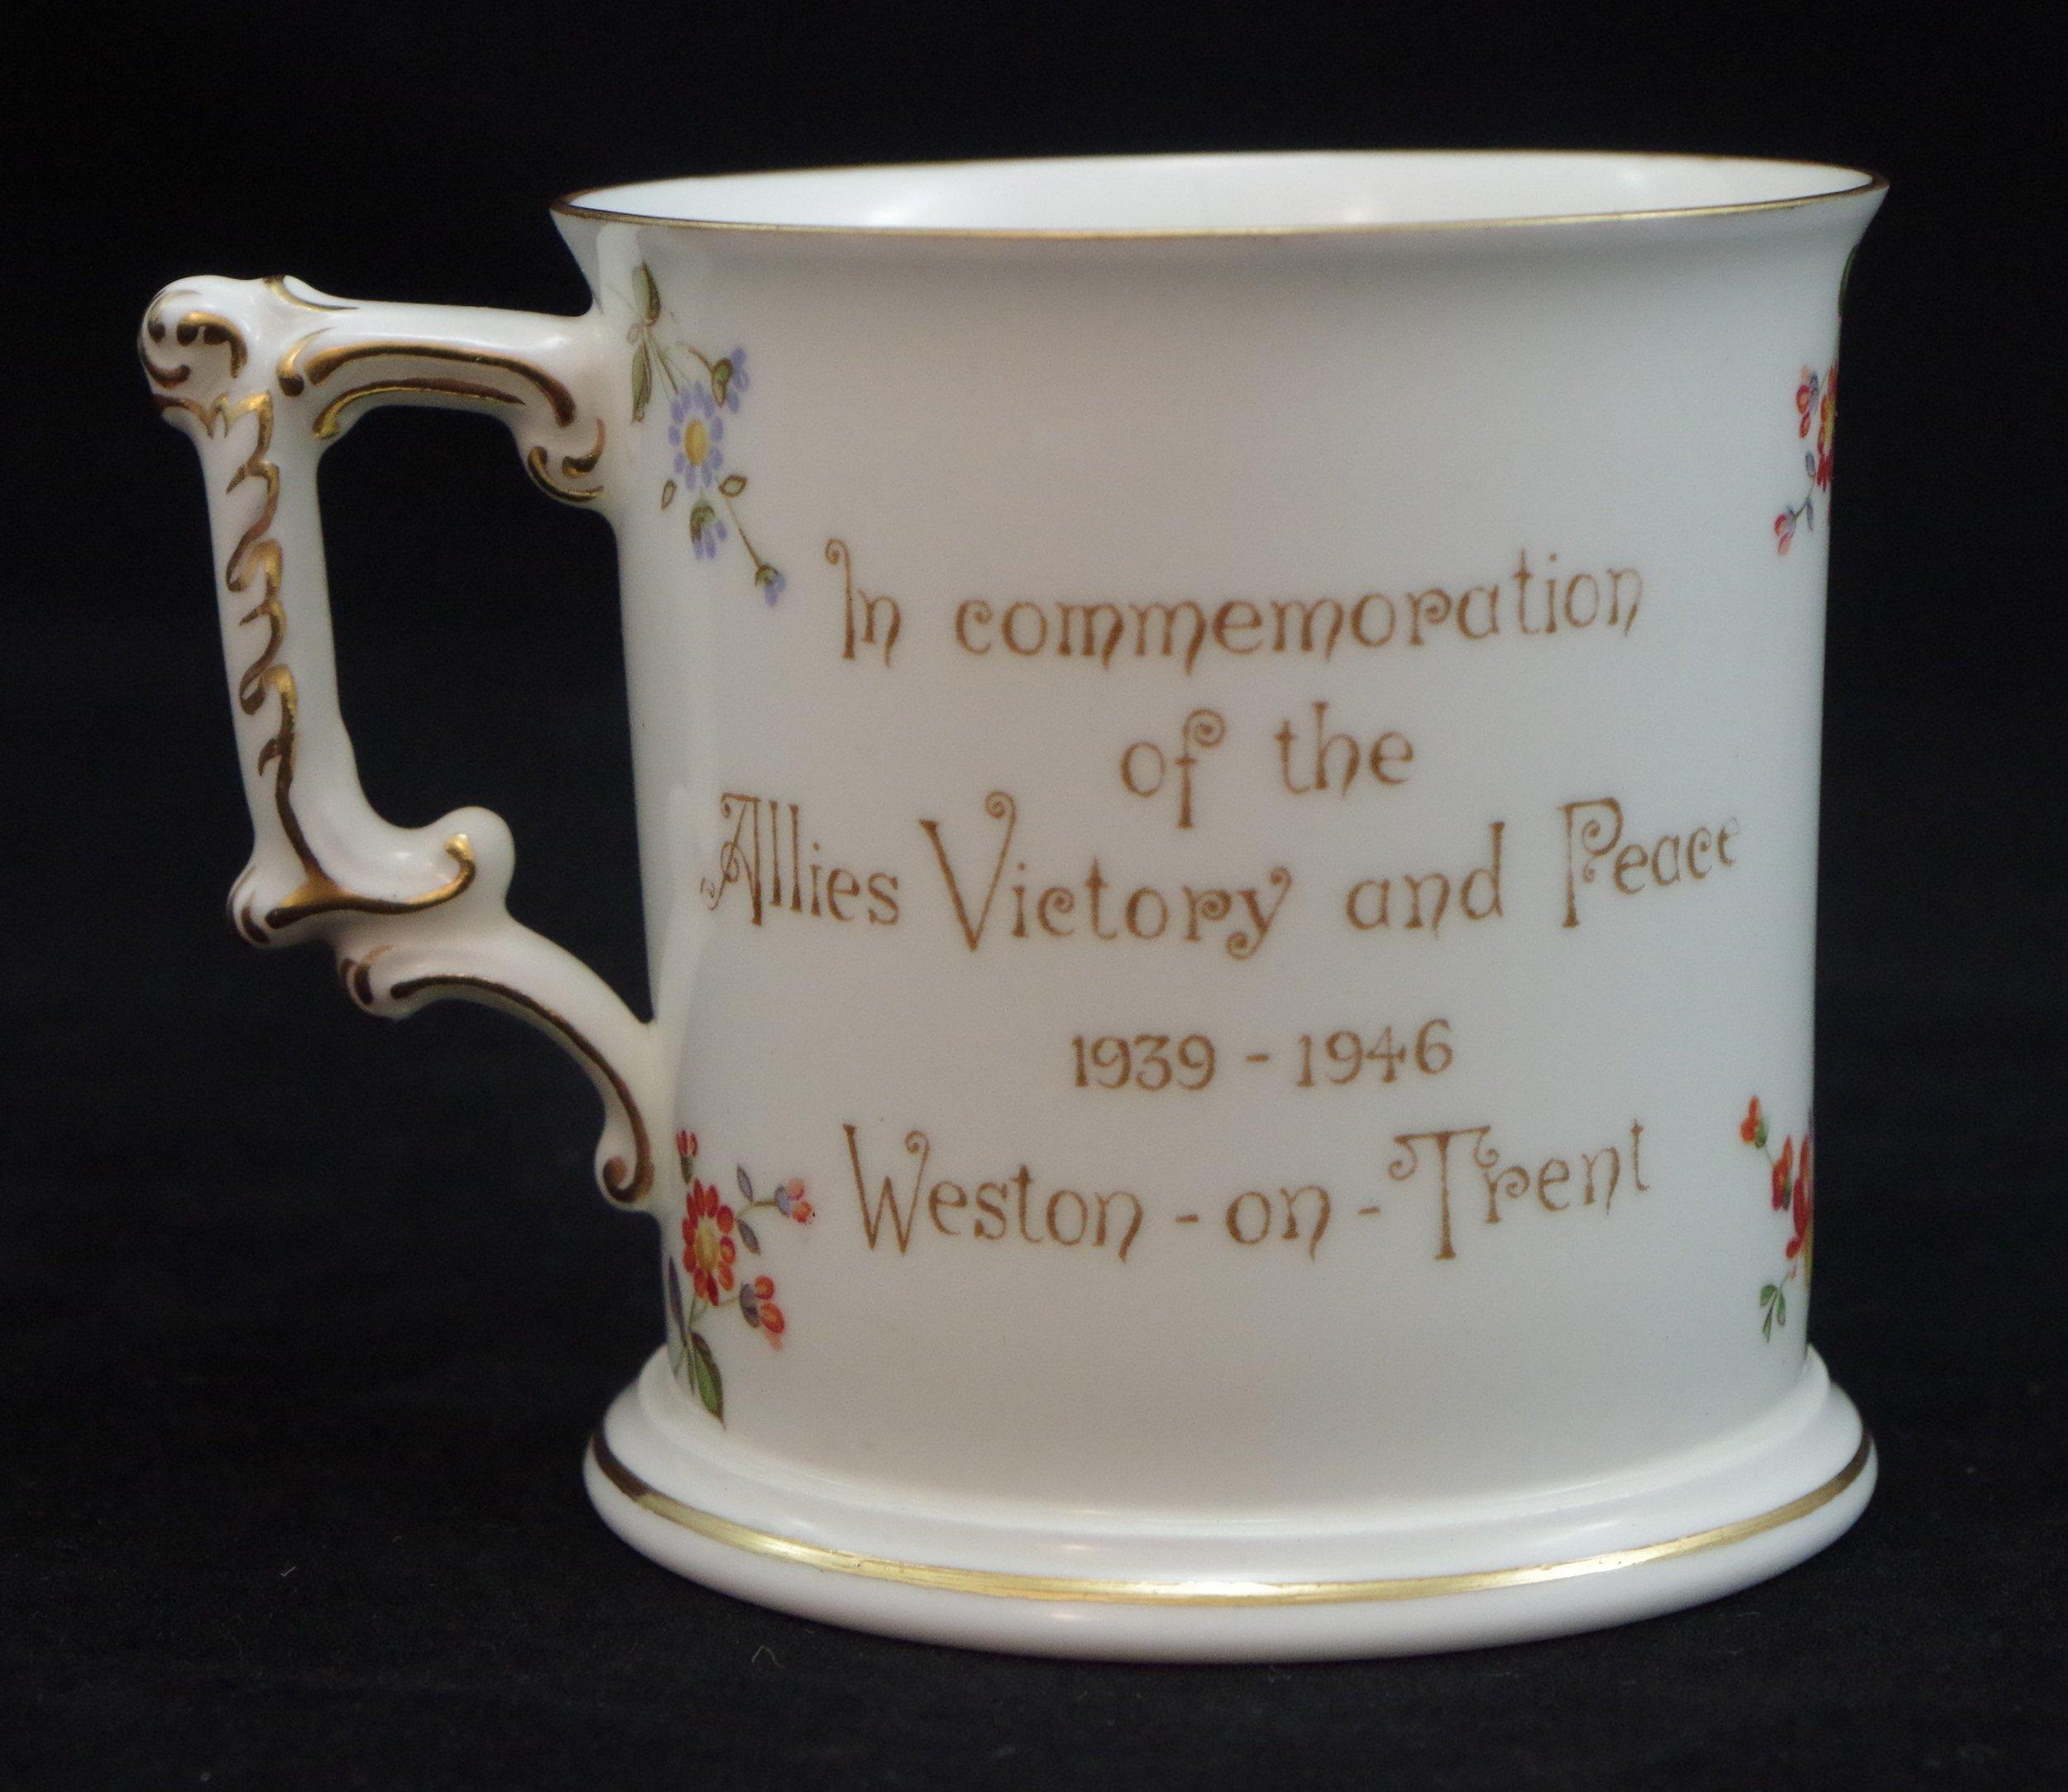 royal-crown-derby-mug-derby-posie-A228-weston-on-trent-reverse